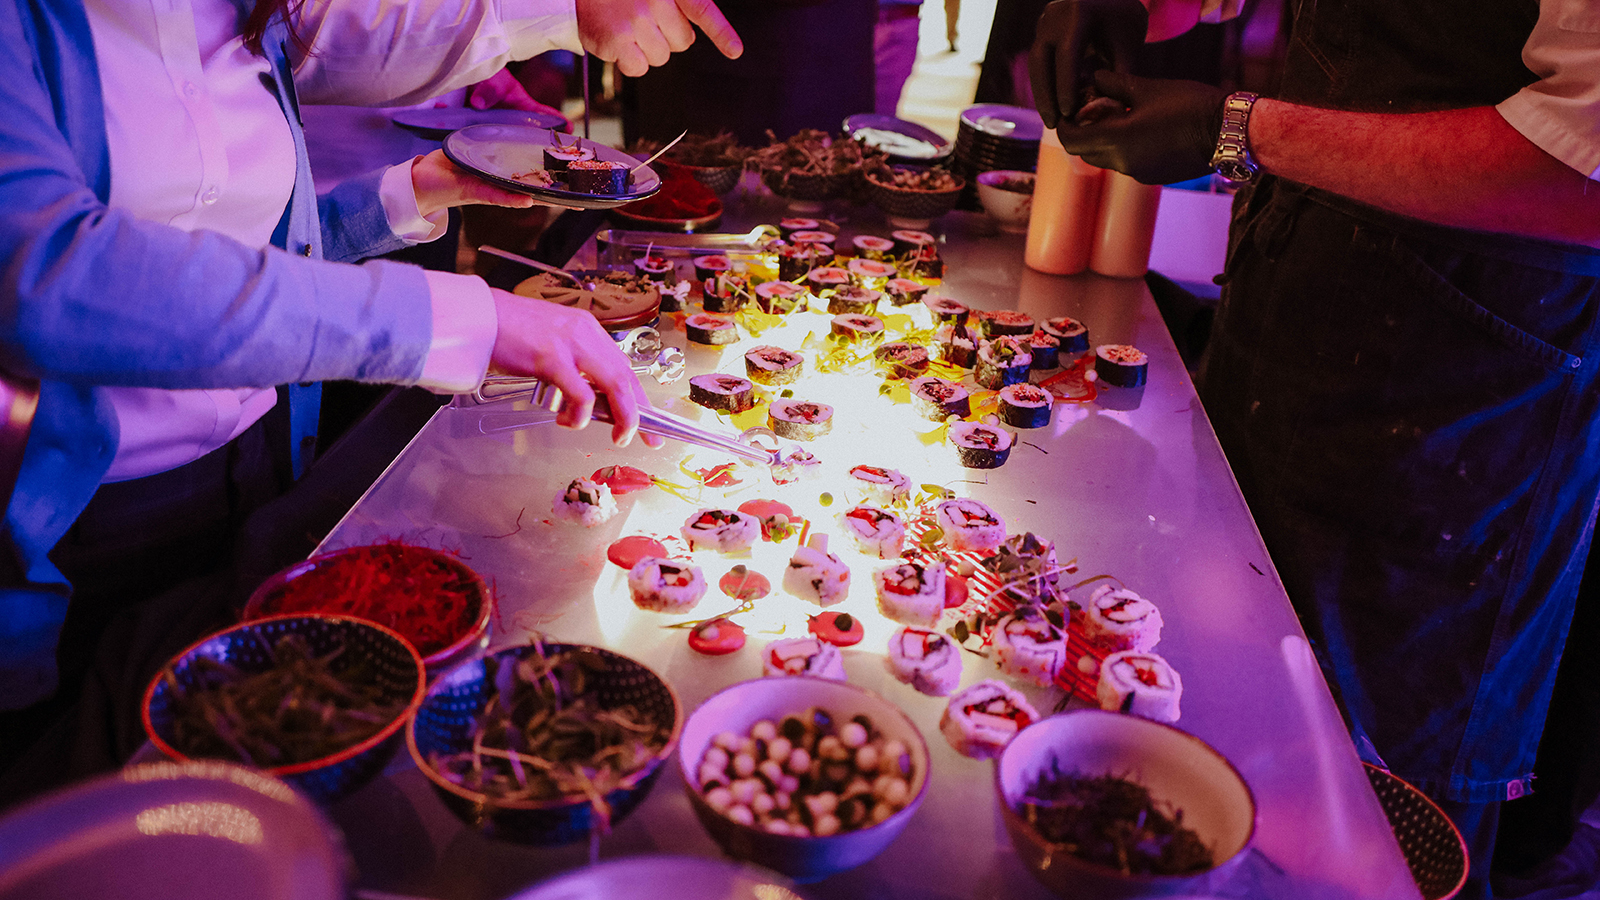 Food Display At Omaha Event